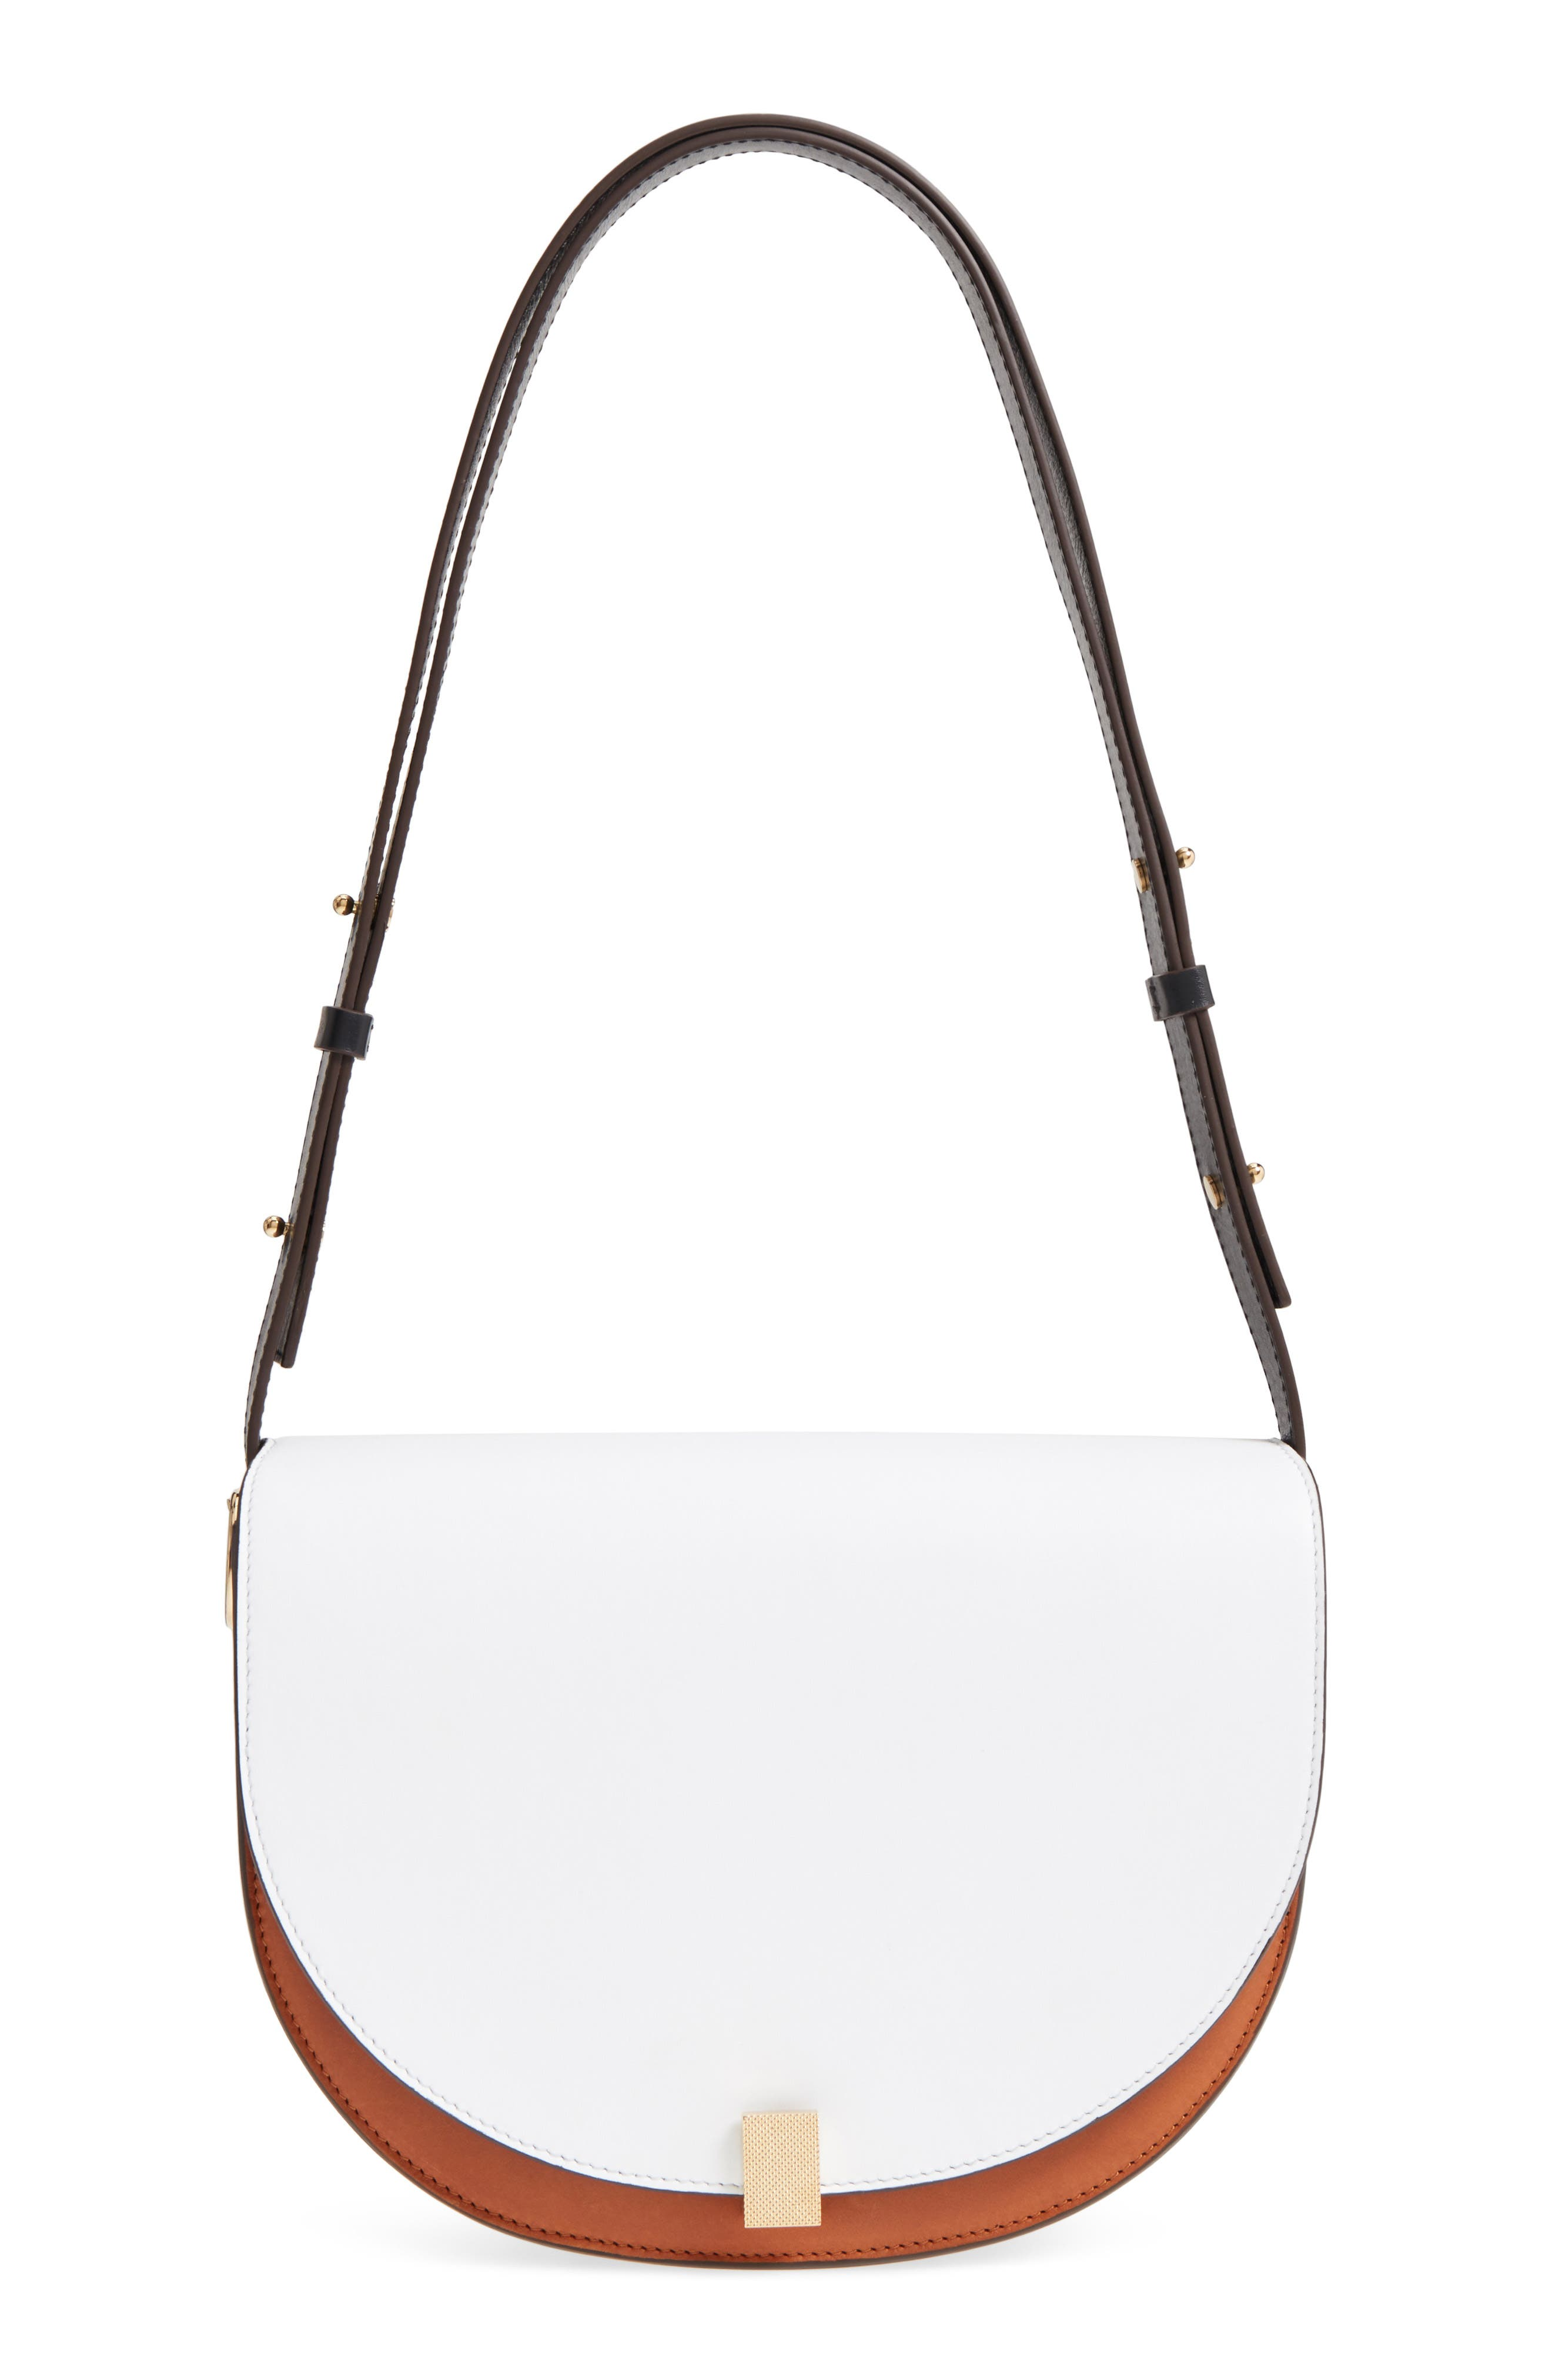 Half Moon Box Shoulder Bag,                             Main thumbnail 1, color,                             White/ Ambra/ Black